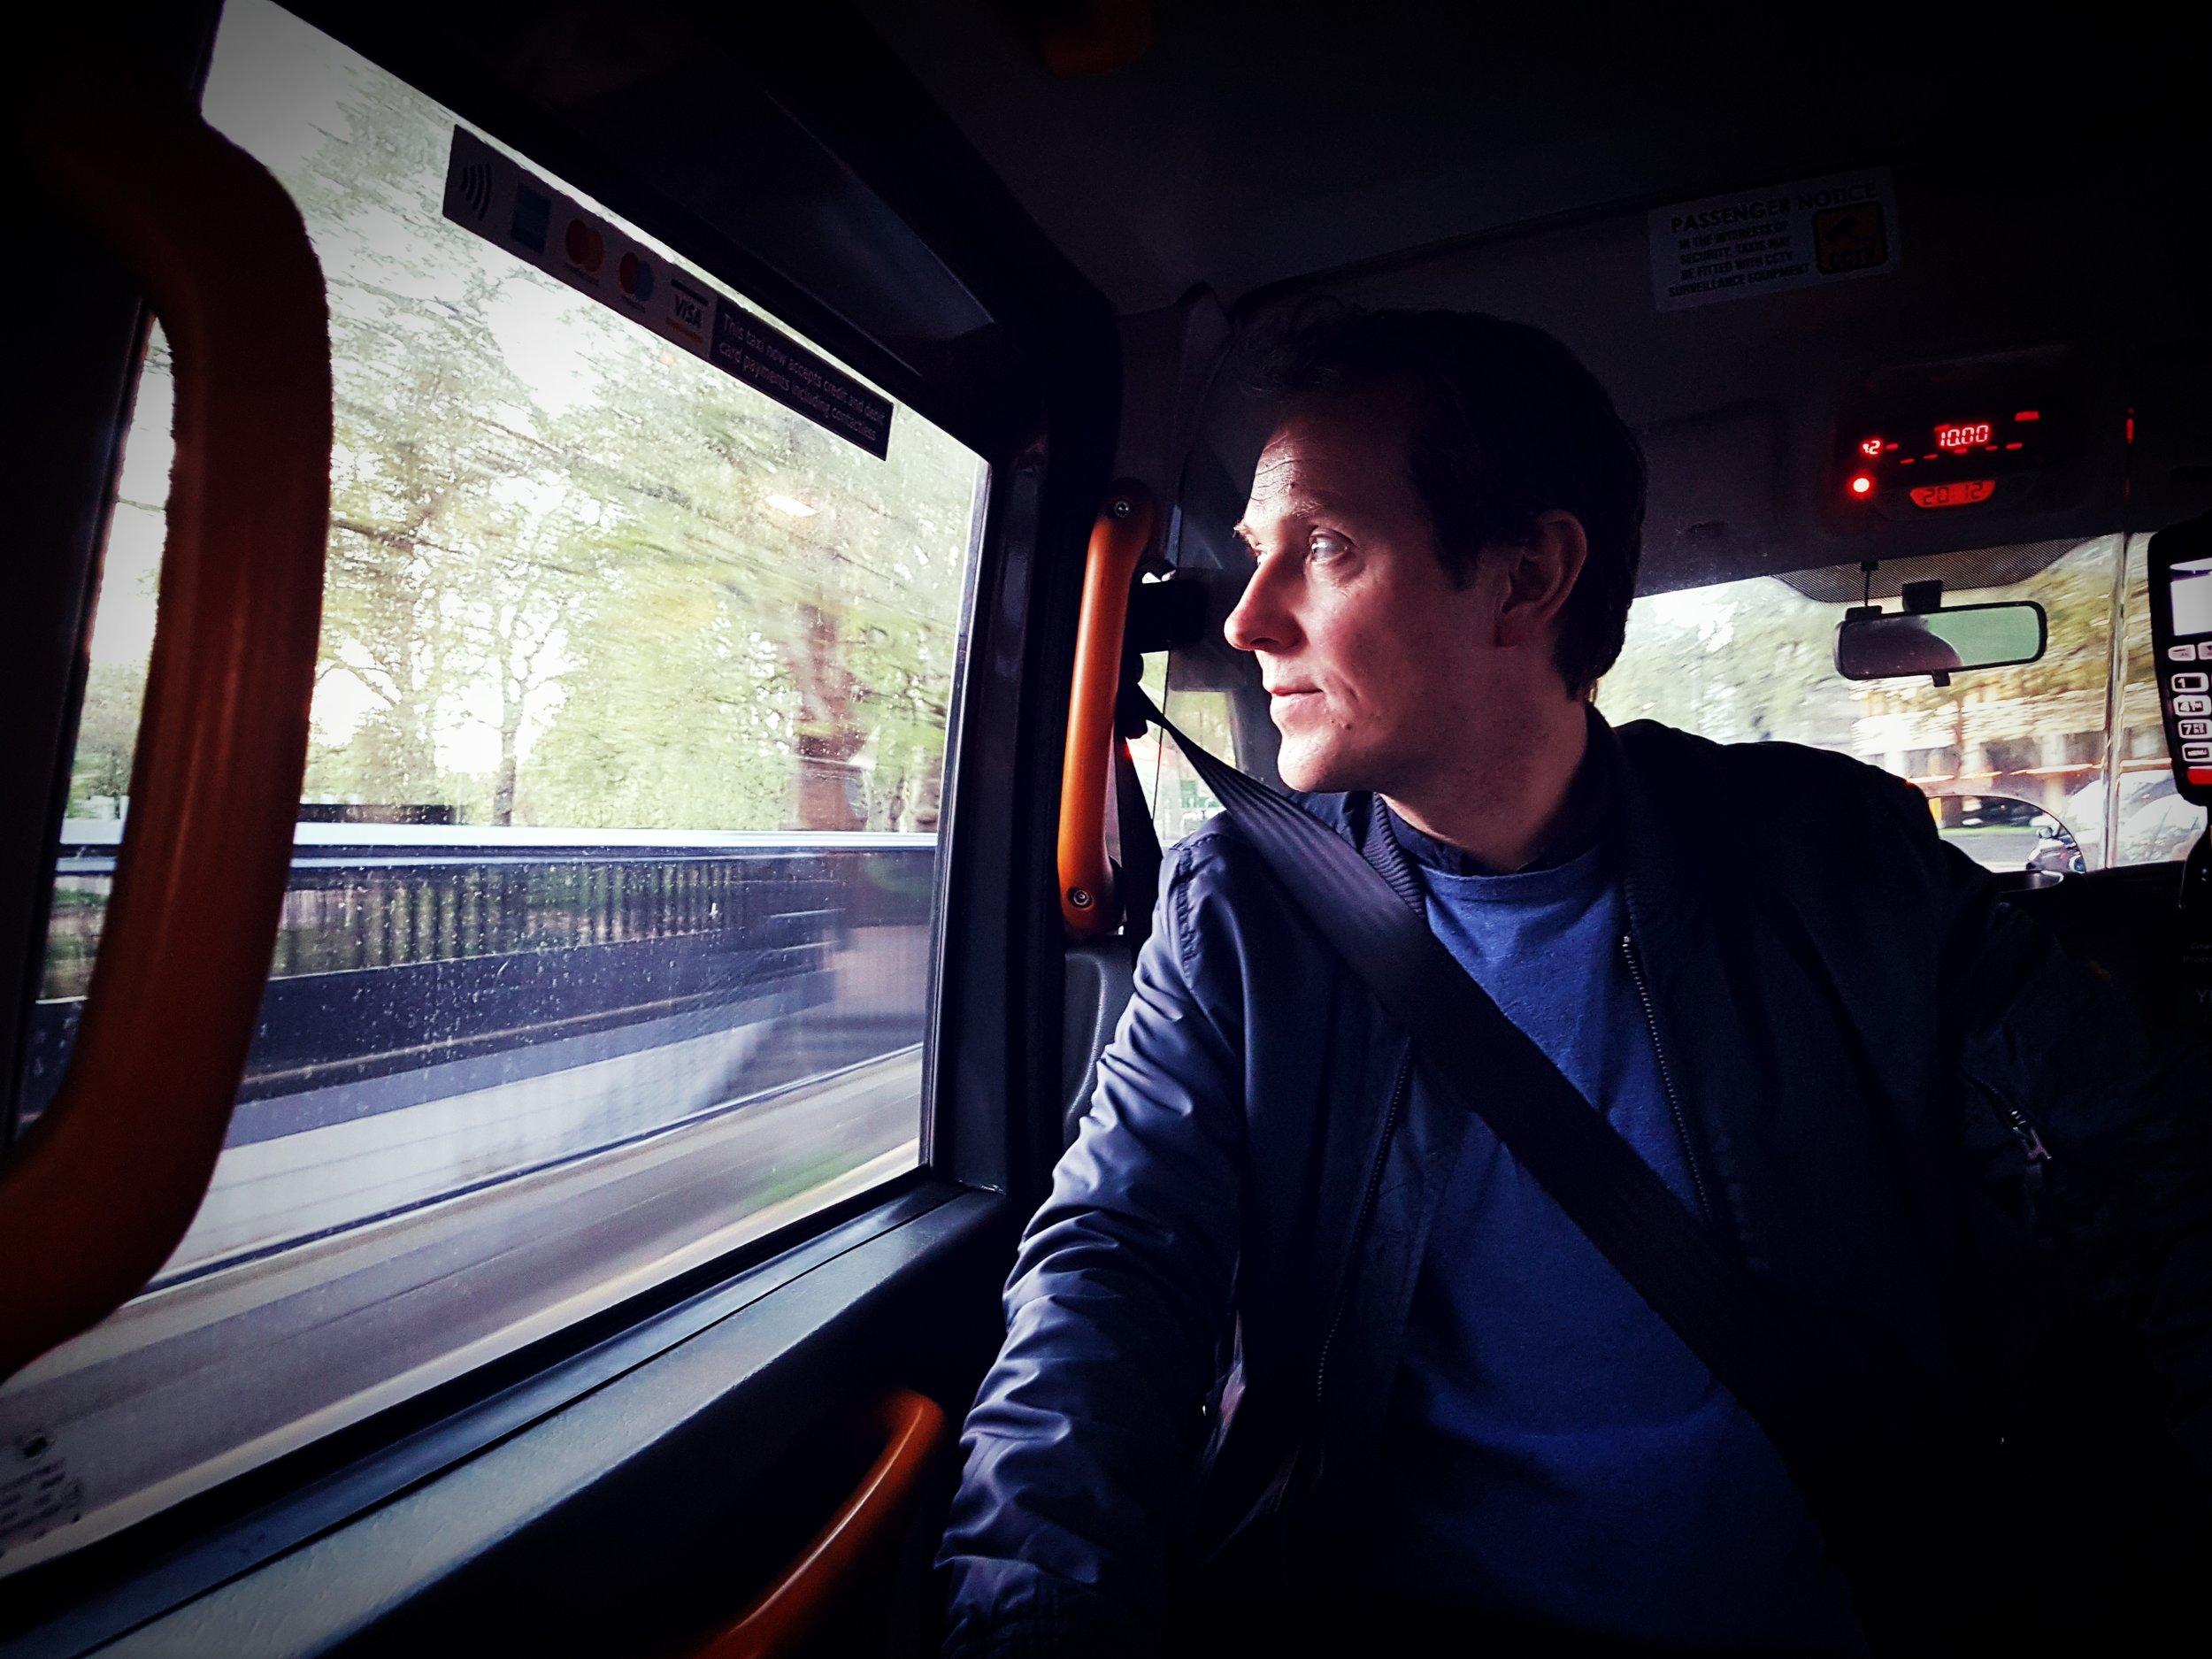 Gisle Østrem on his way to Abbey Road Studios, London